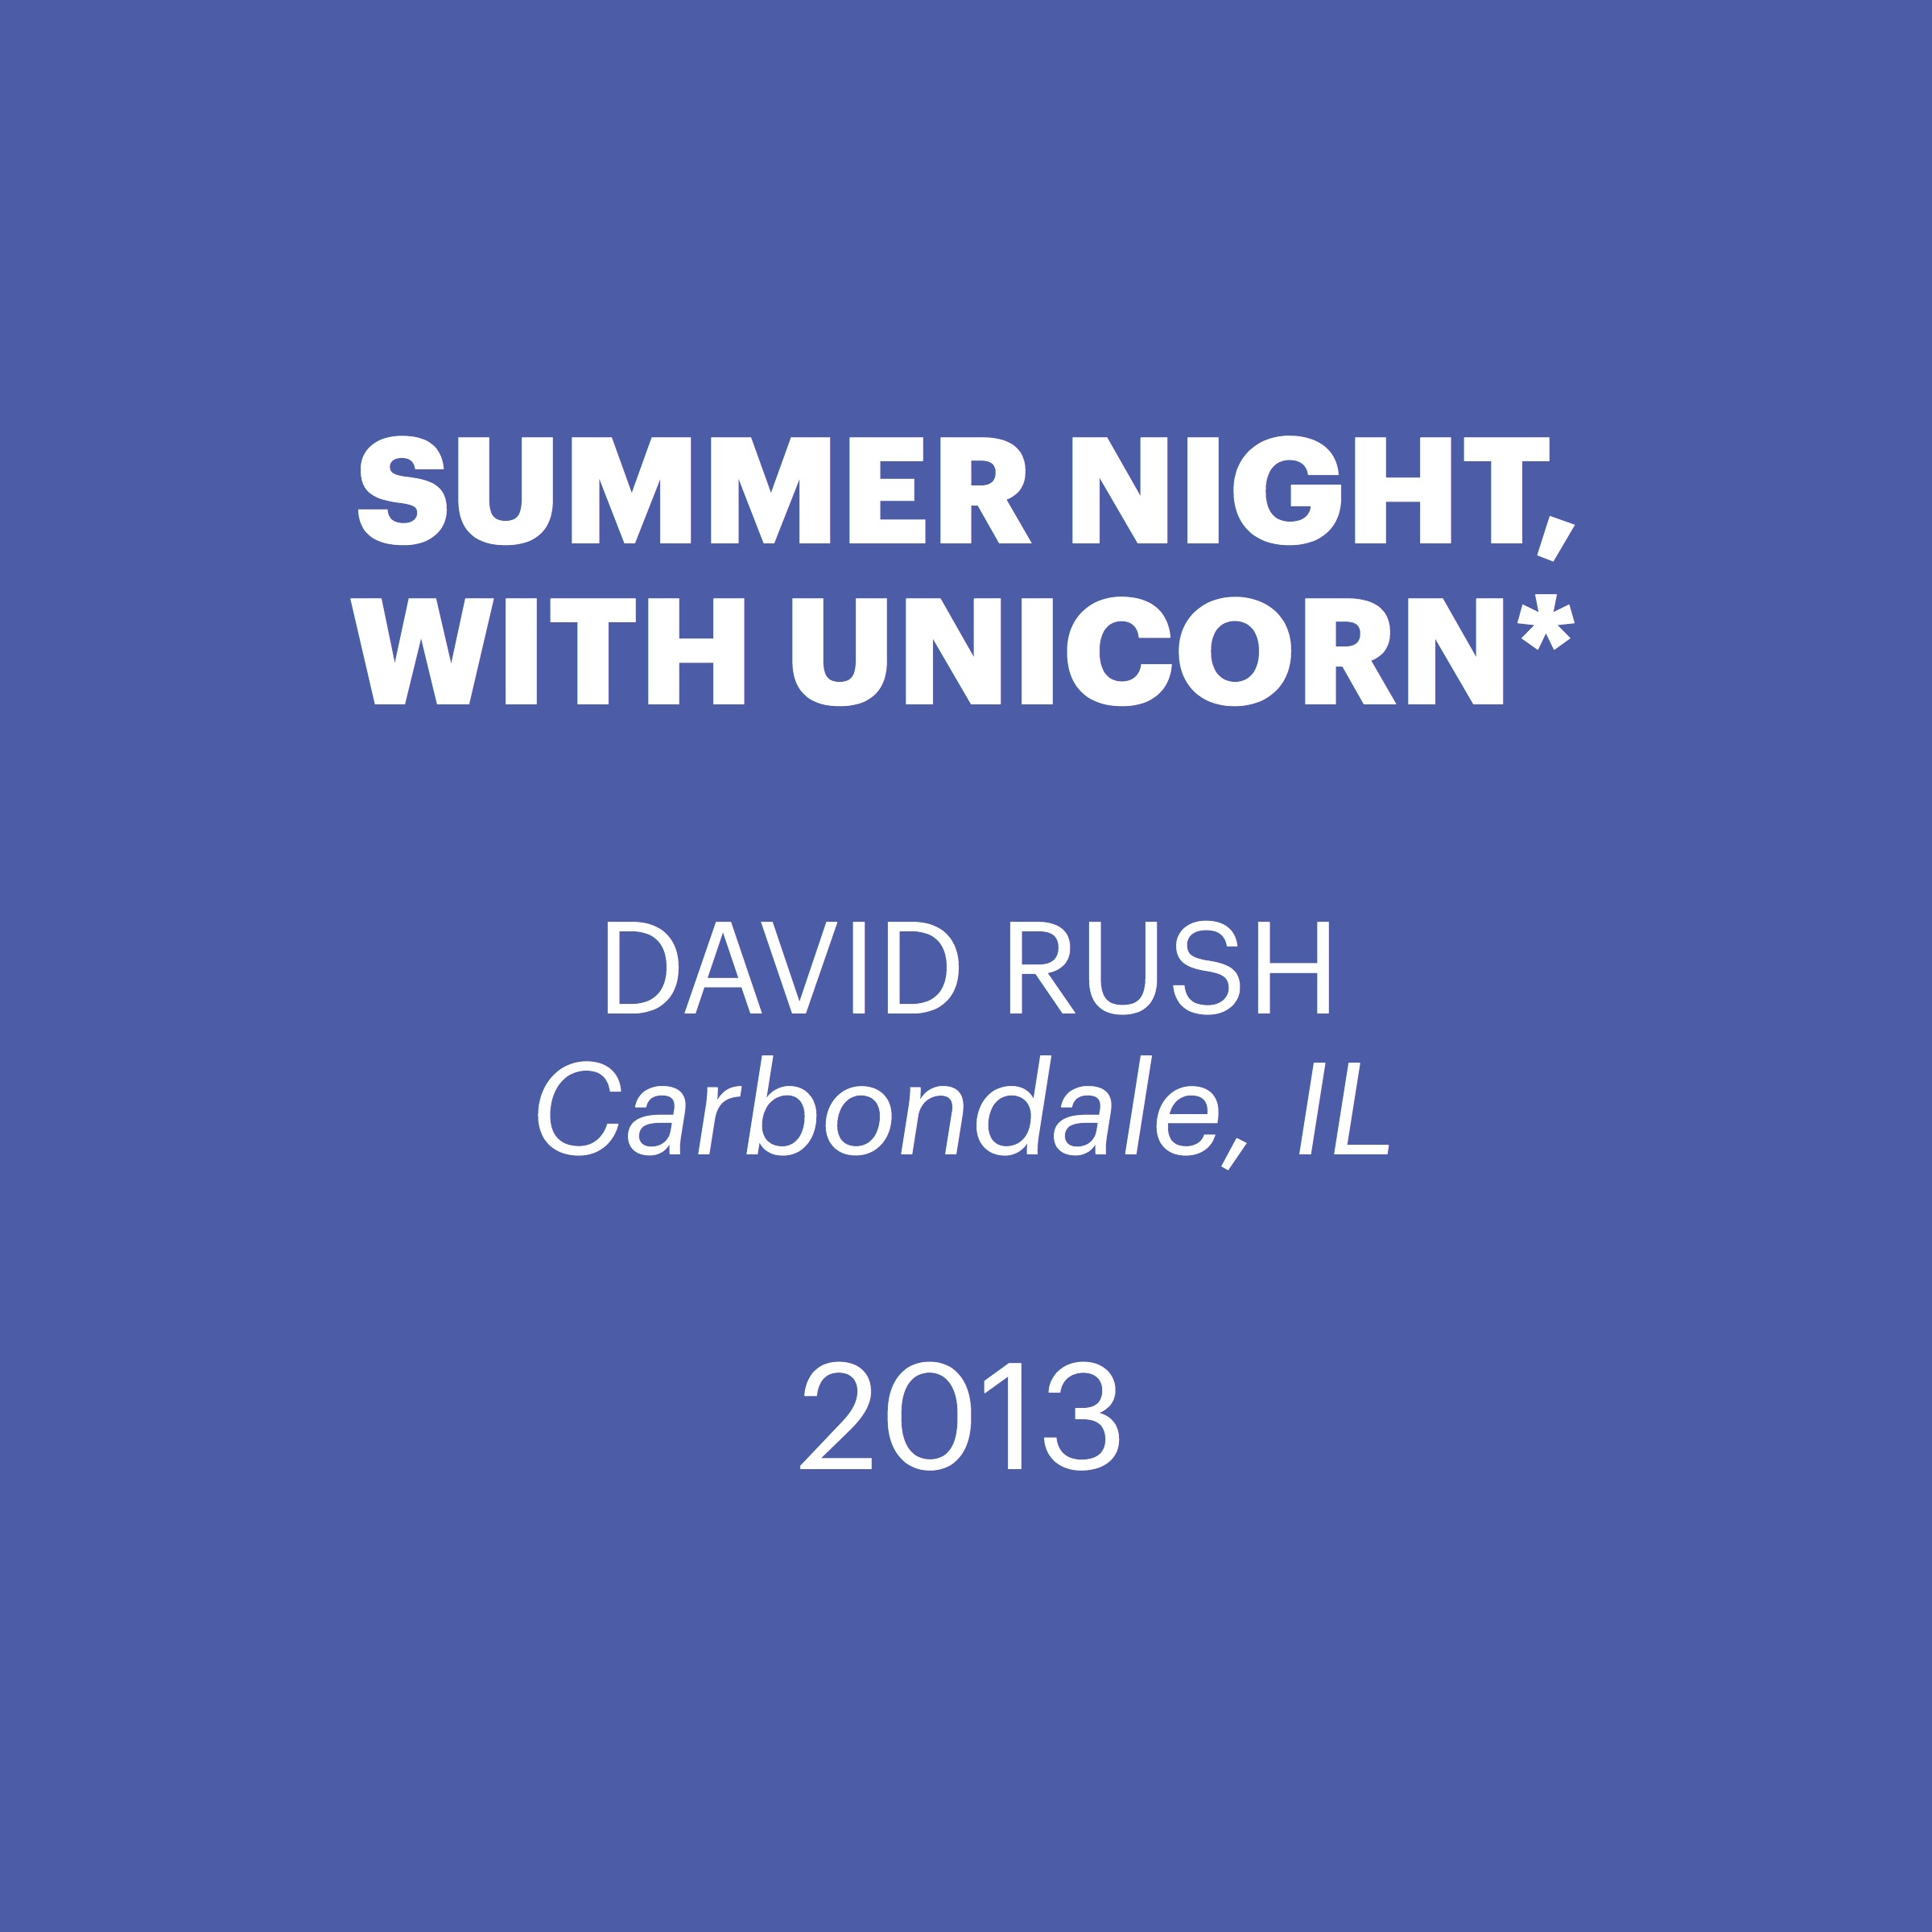 Summer Night Title.jpg